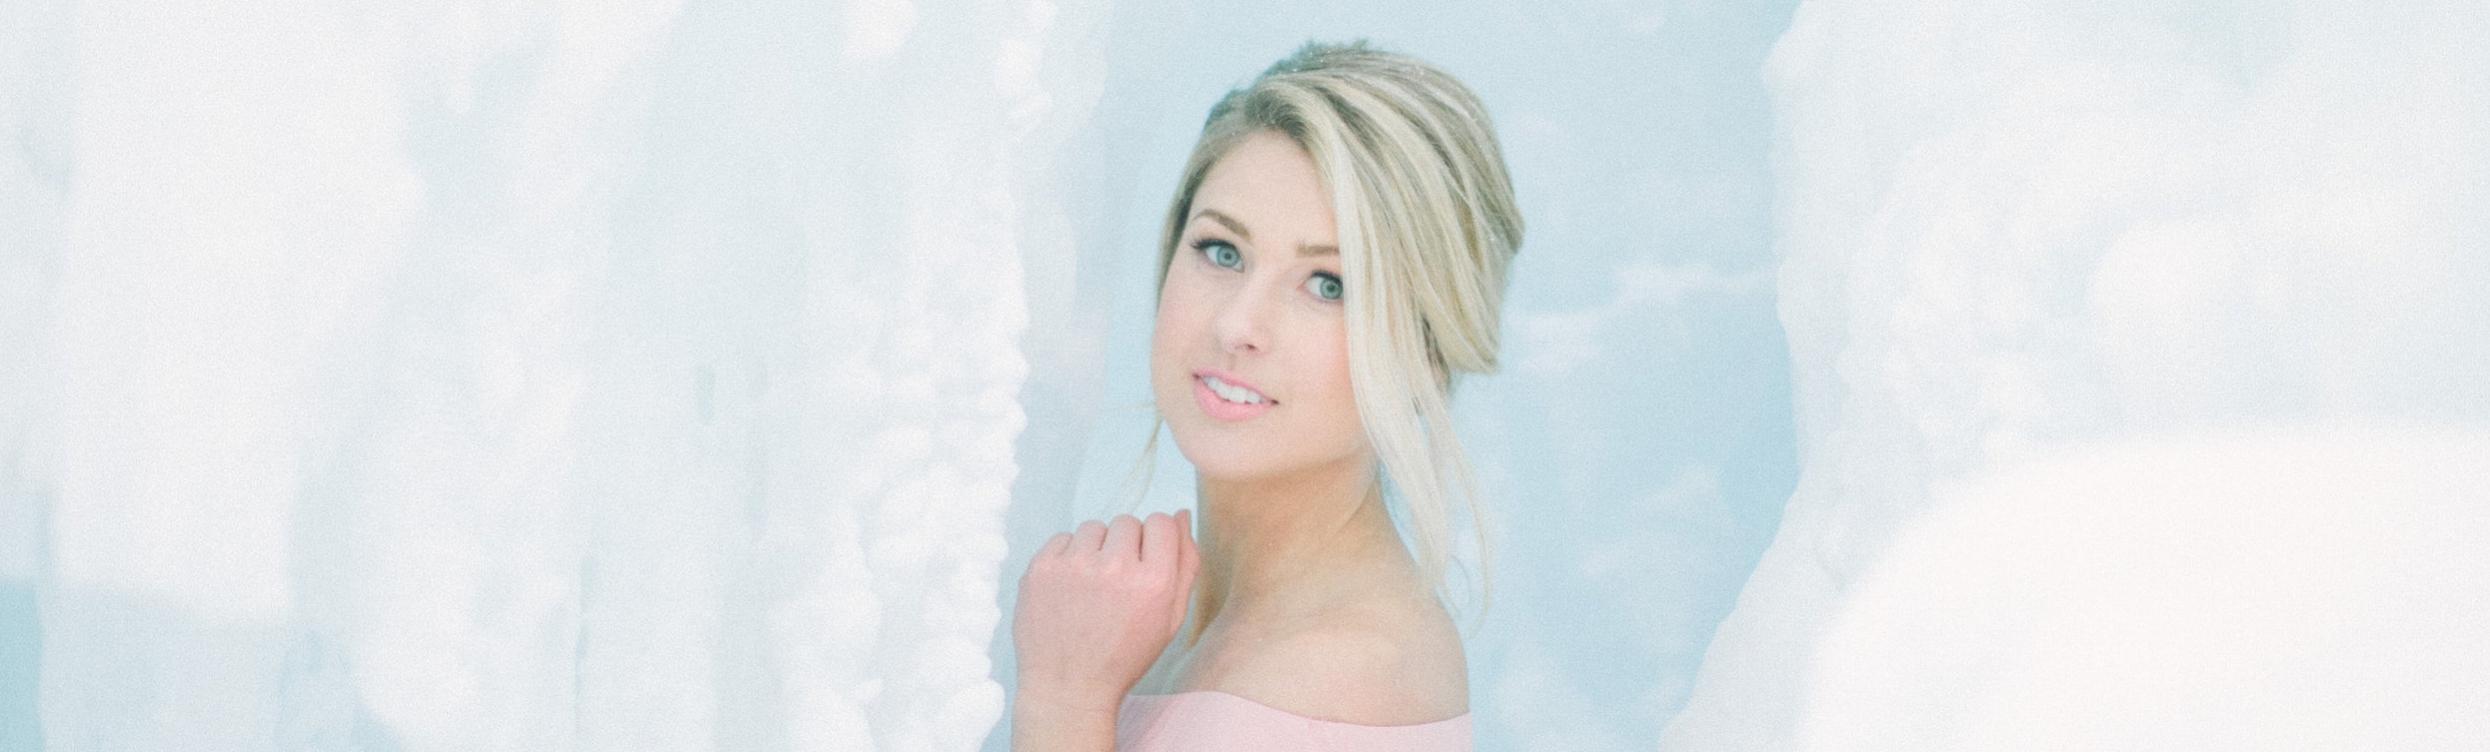 ice castles Jenny FINAL-0011.jpg